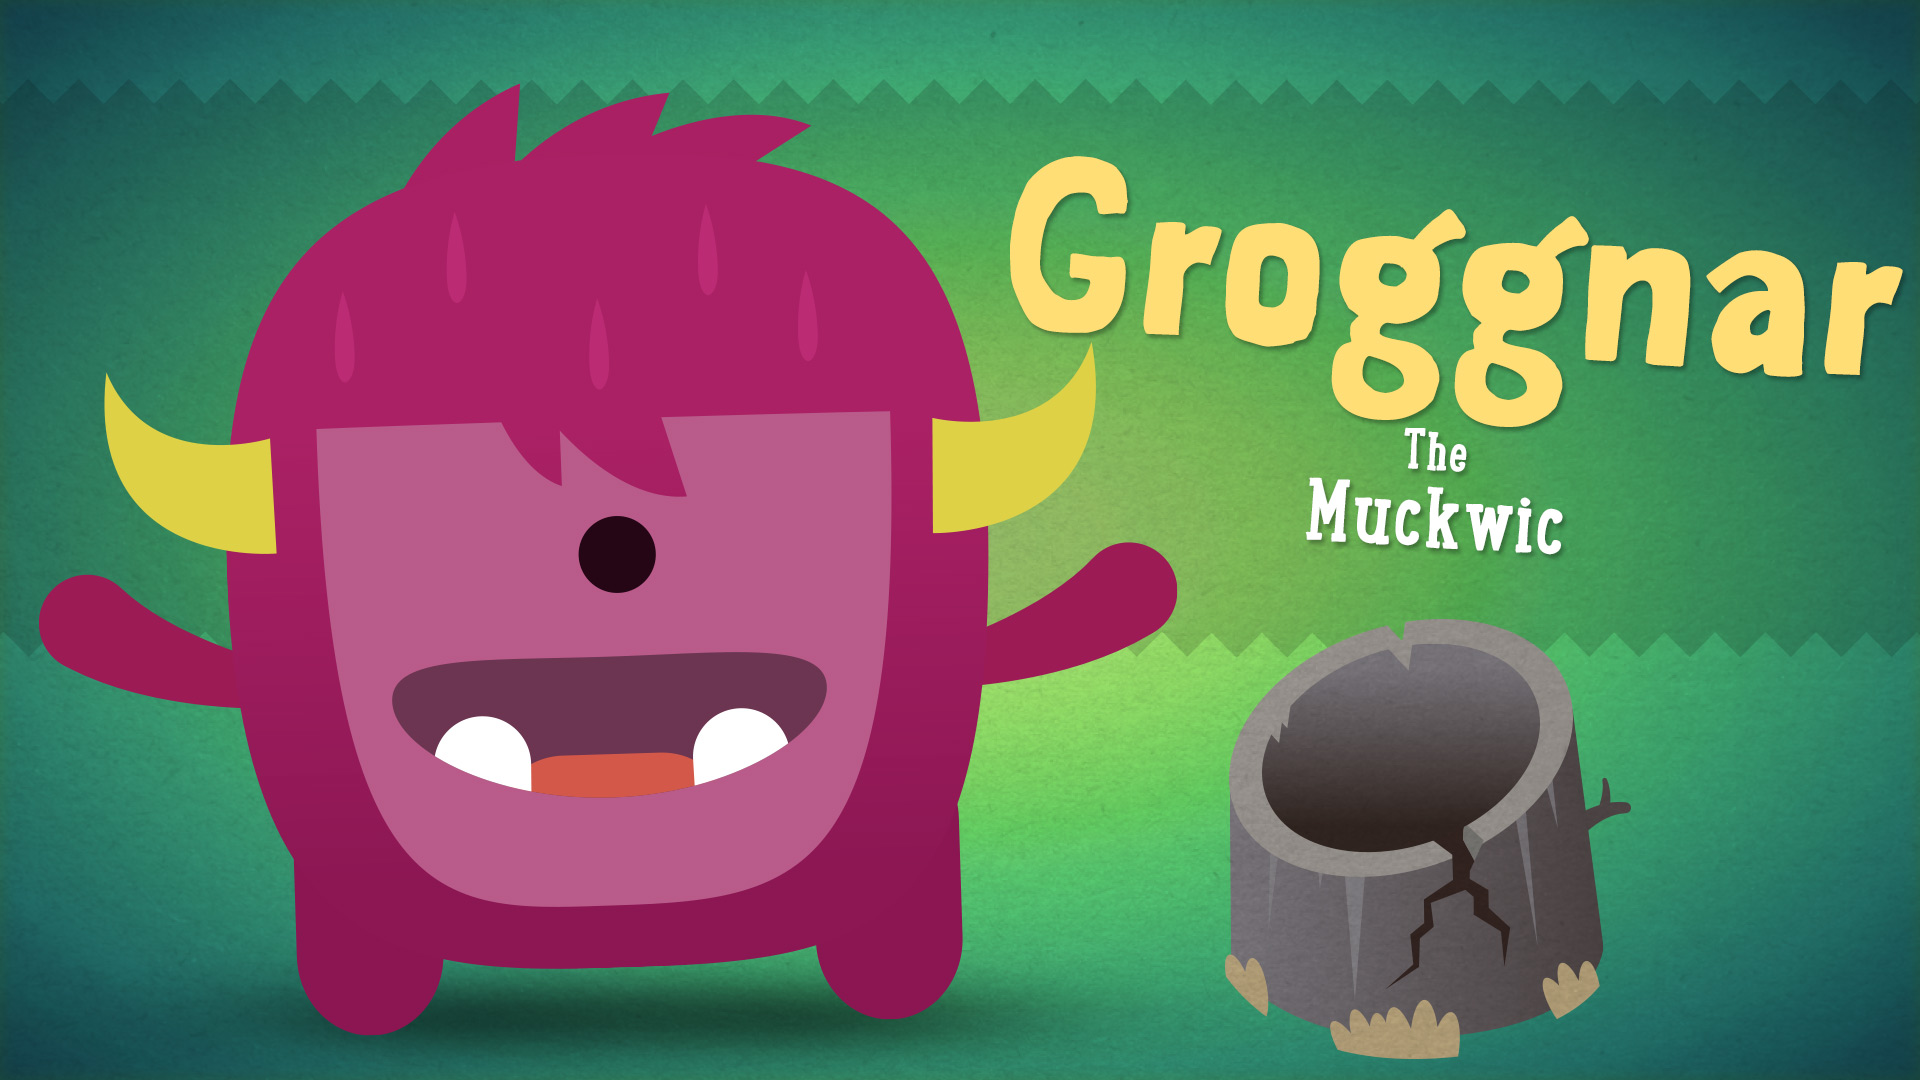 Monsters Ate My Birthday Cake Groggnar Steam Trading Cards Wiki